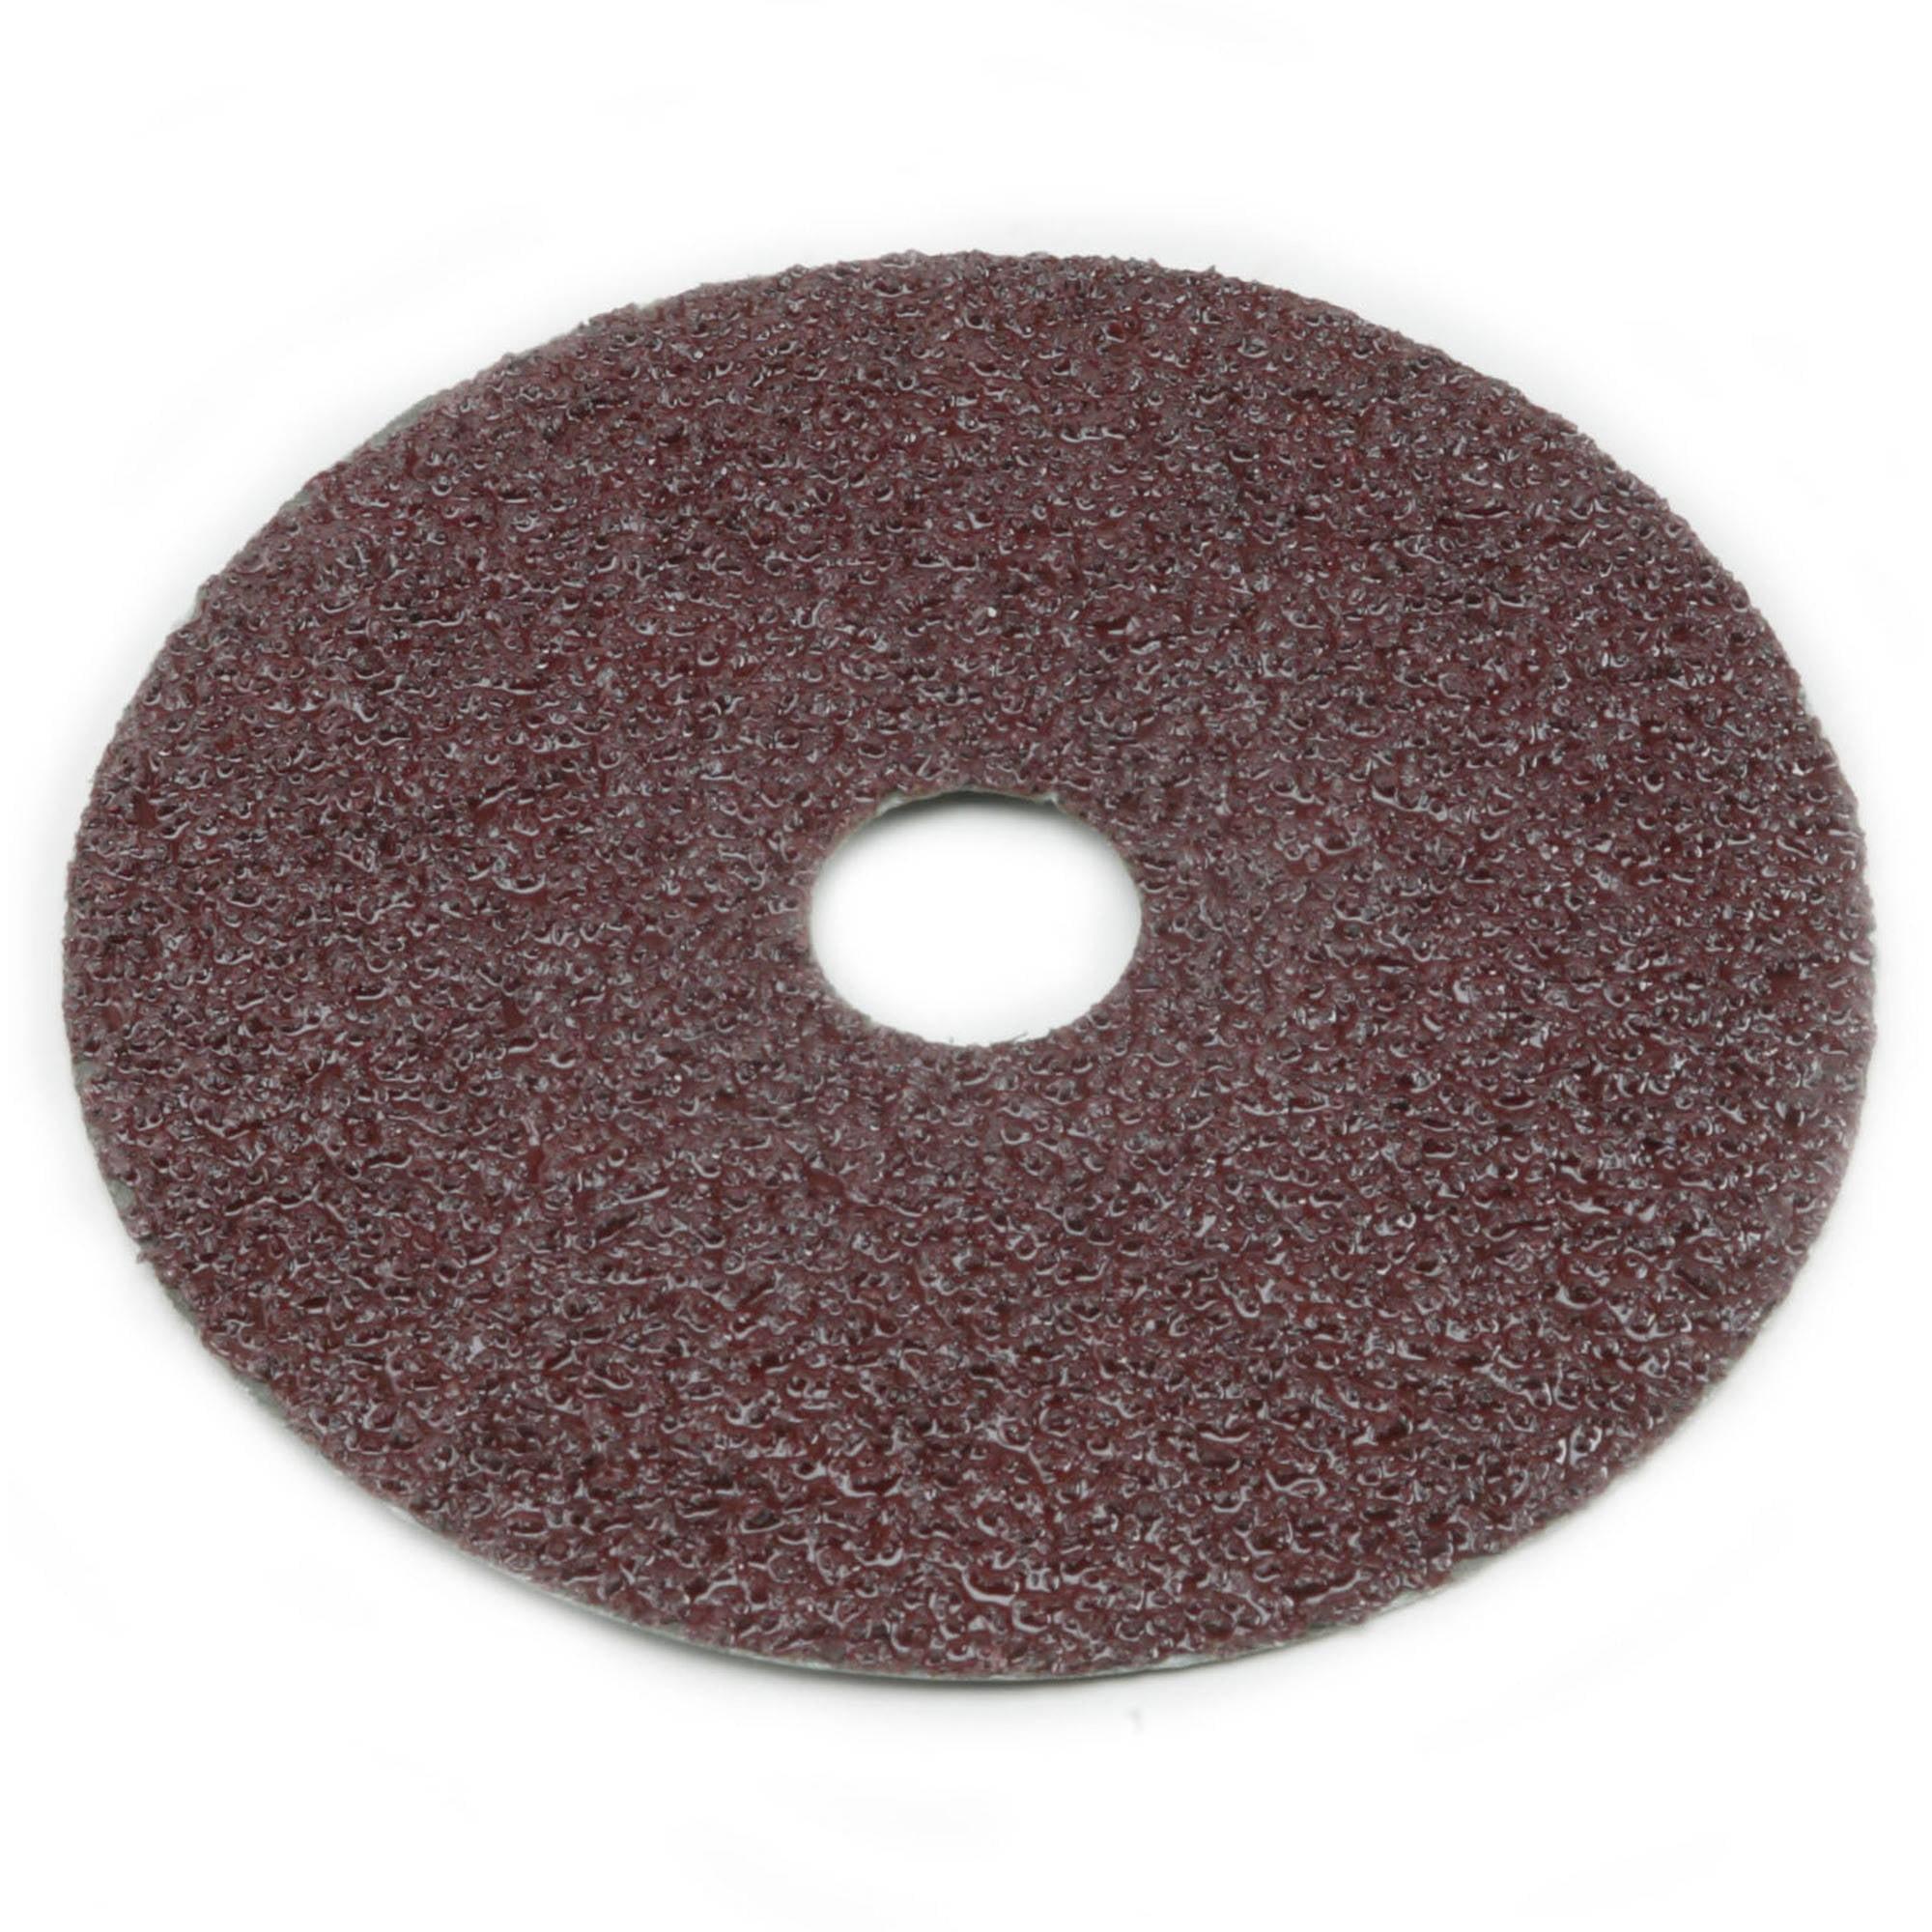 25-Pack Sungold Abrasives 16908 4-1//2 X 7//8 Center Hole 120 Grit Aluminum Oxide Fiber Disc